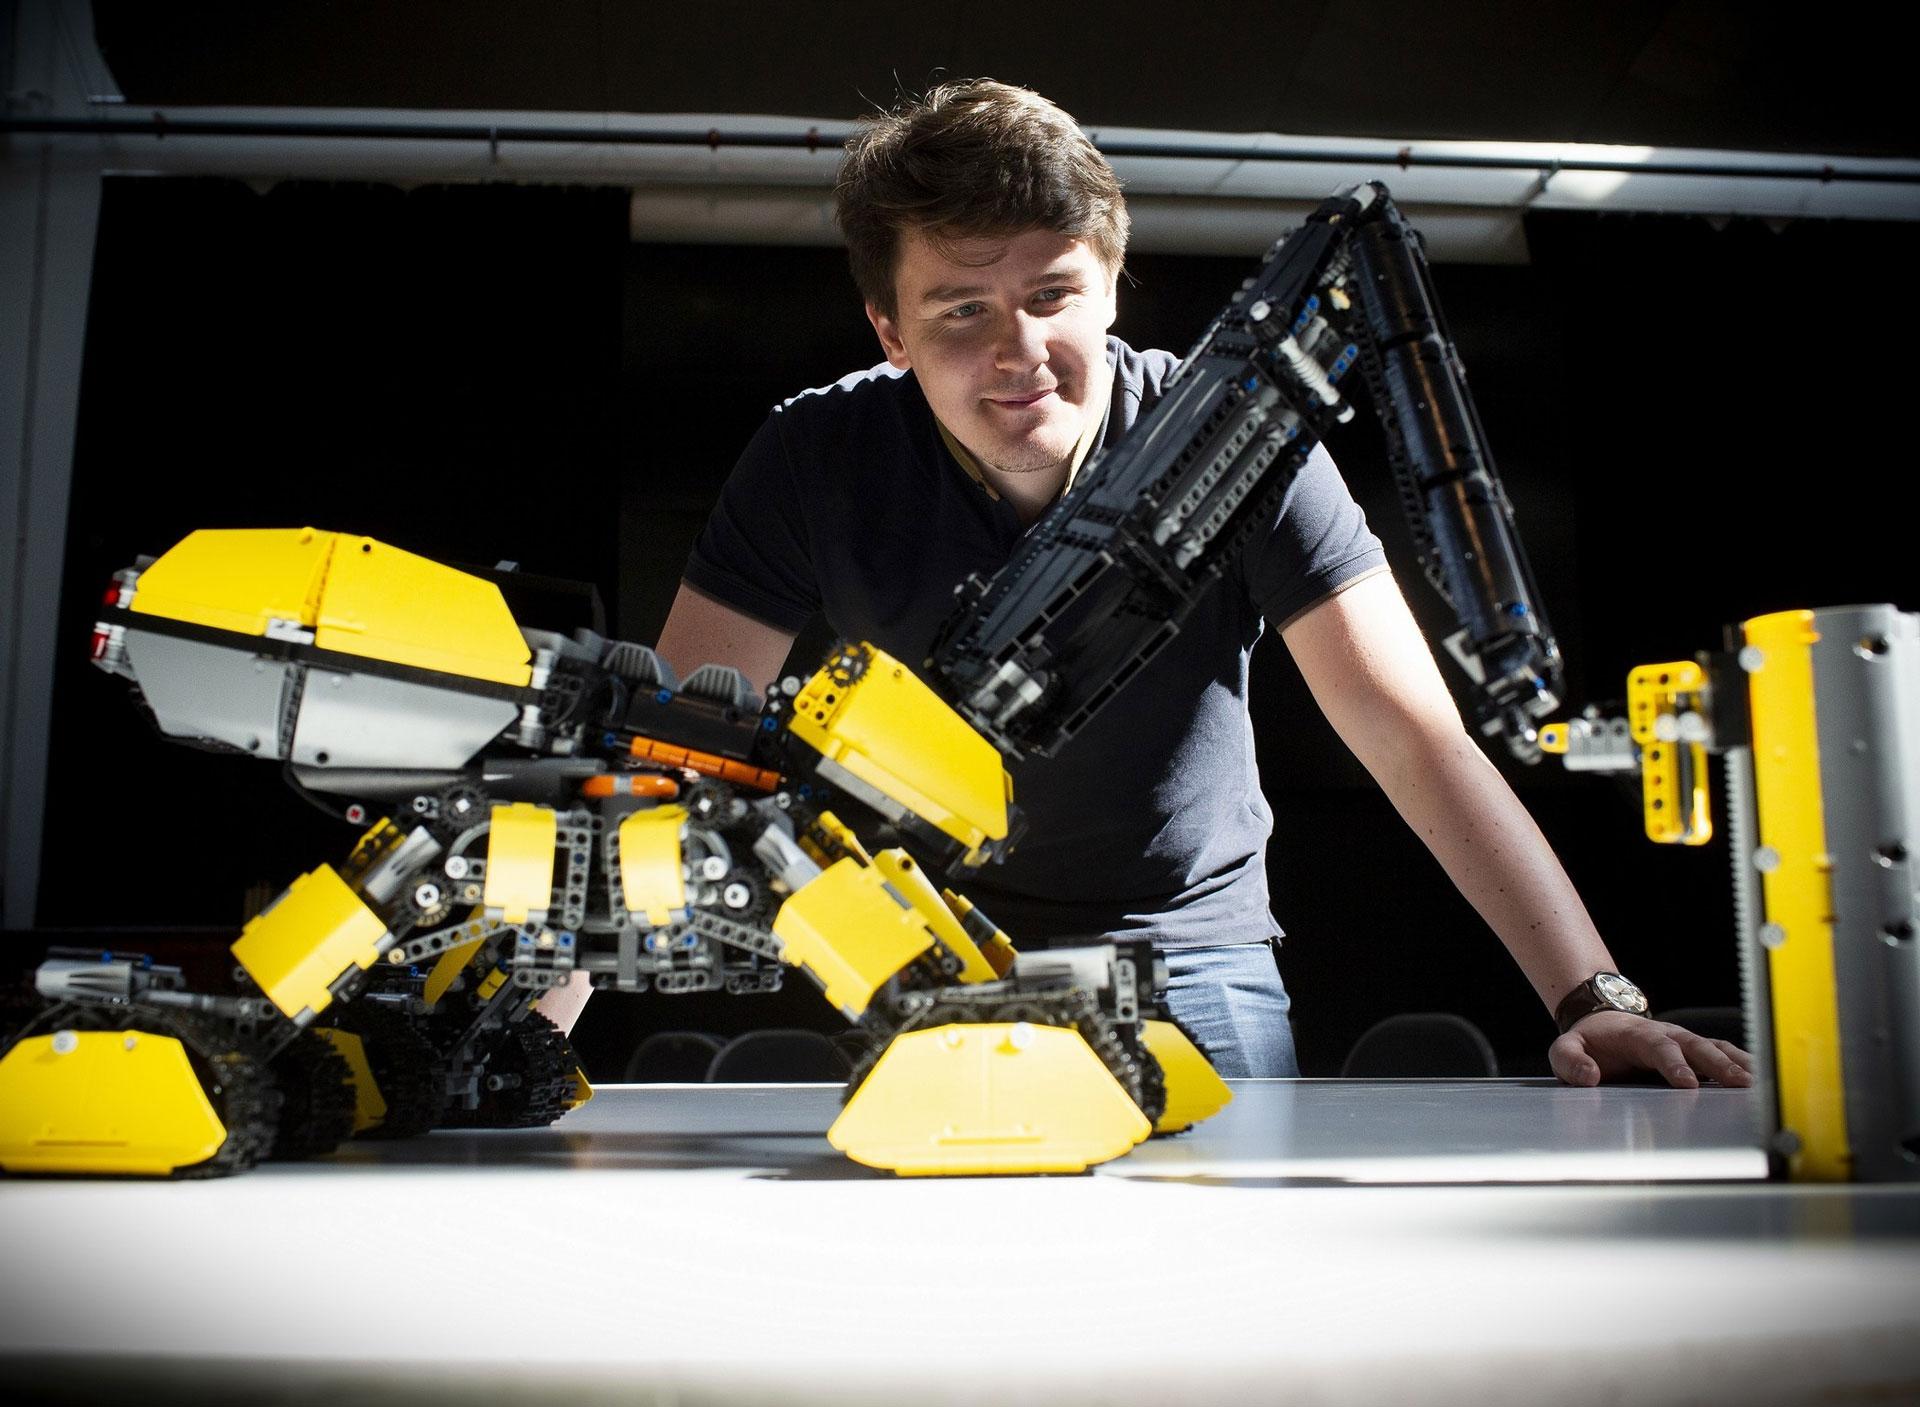 future construction machines LEGO